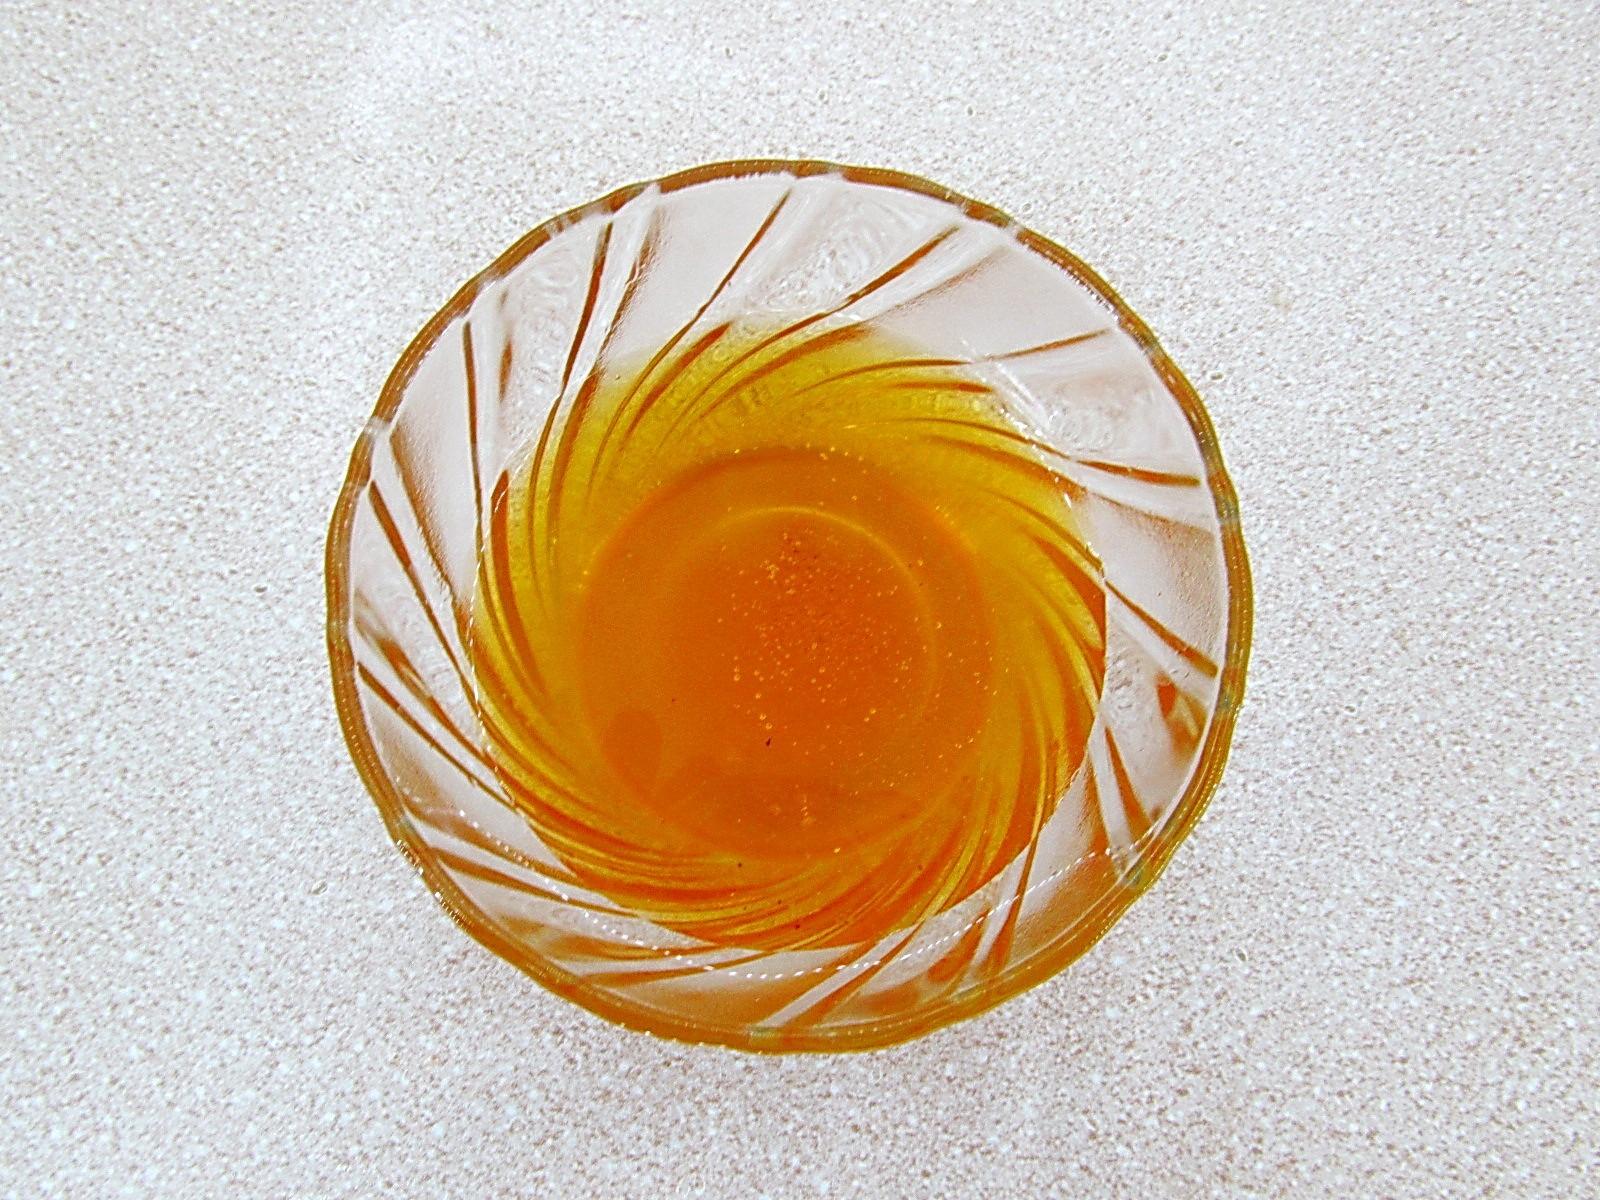 Мед при необходимости прогреваем на водяной бане